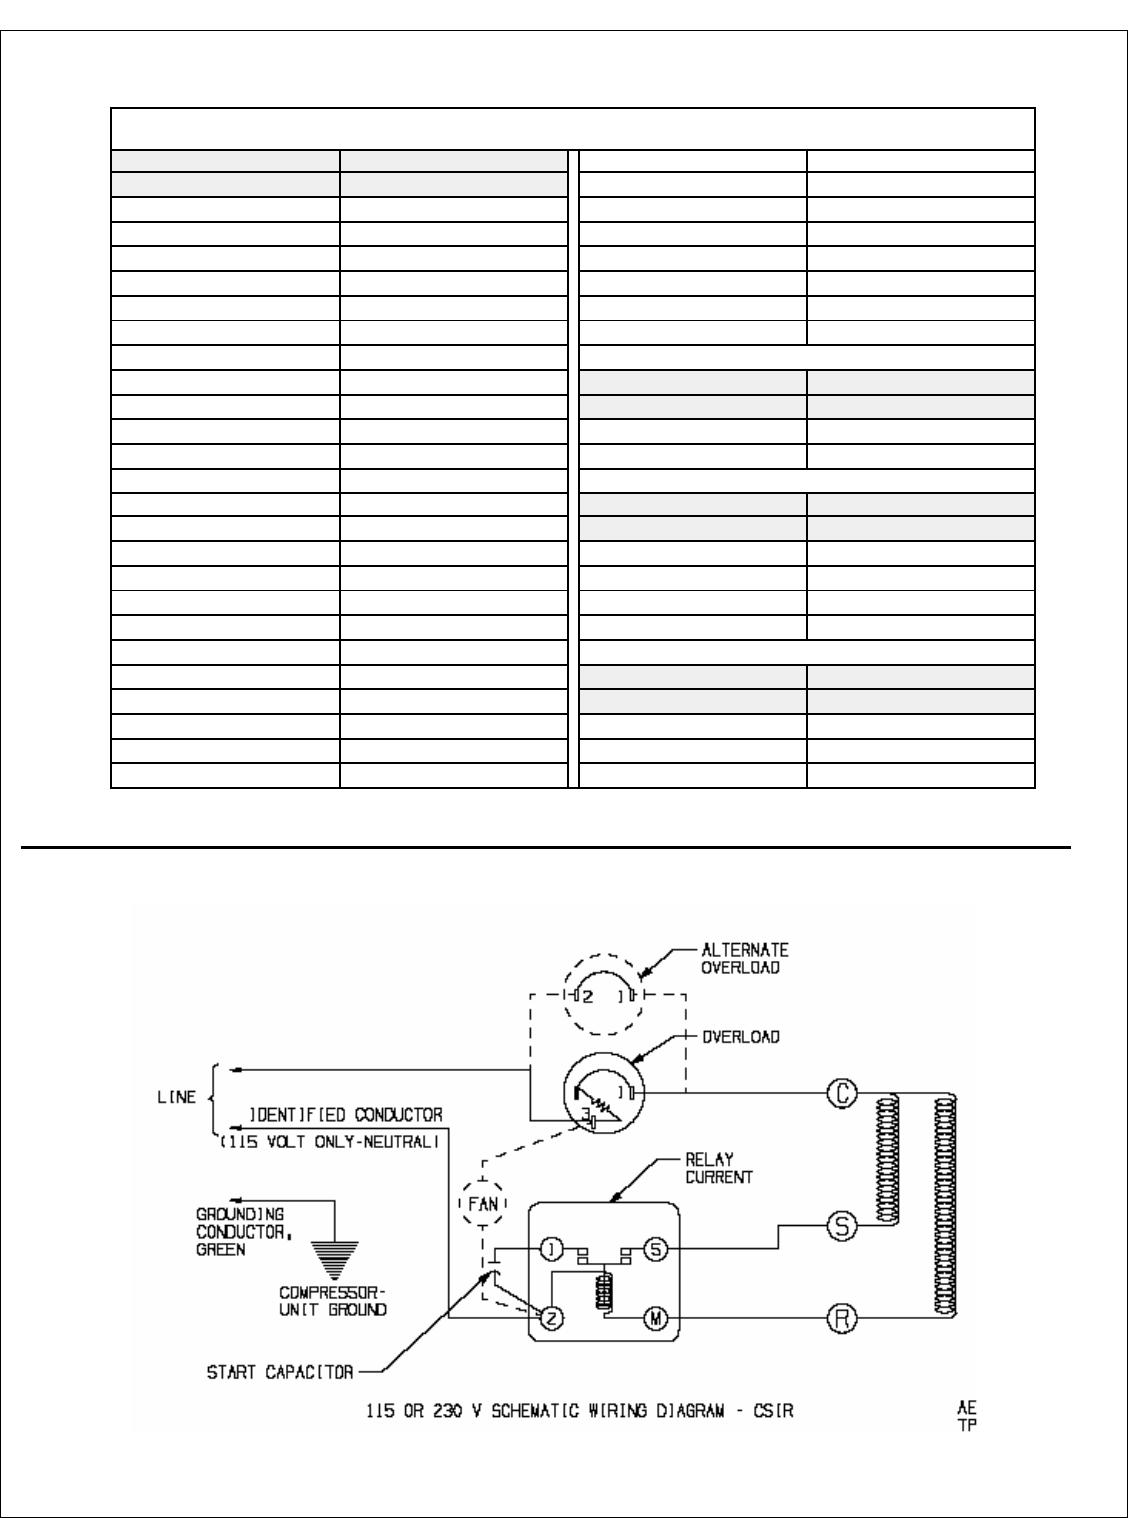 Tecumseh Tpb9423yaacb Performance Data Sheet Tpb9423yaack 32g340 Wiring Diagram L Andreea Temp Sheetsegad Datasheetsmaster Filestpb9423yaack Xxxp Reldoc 26 04 2011